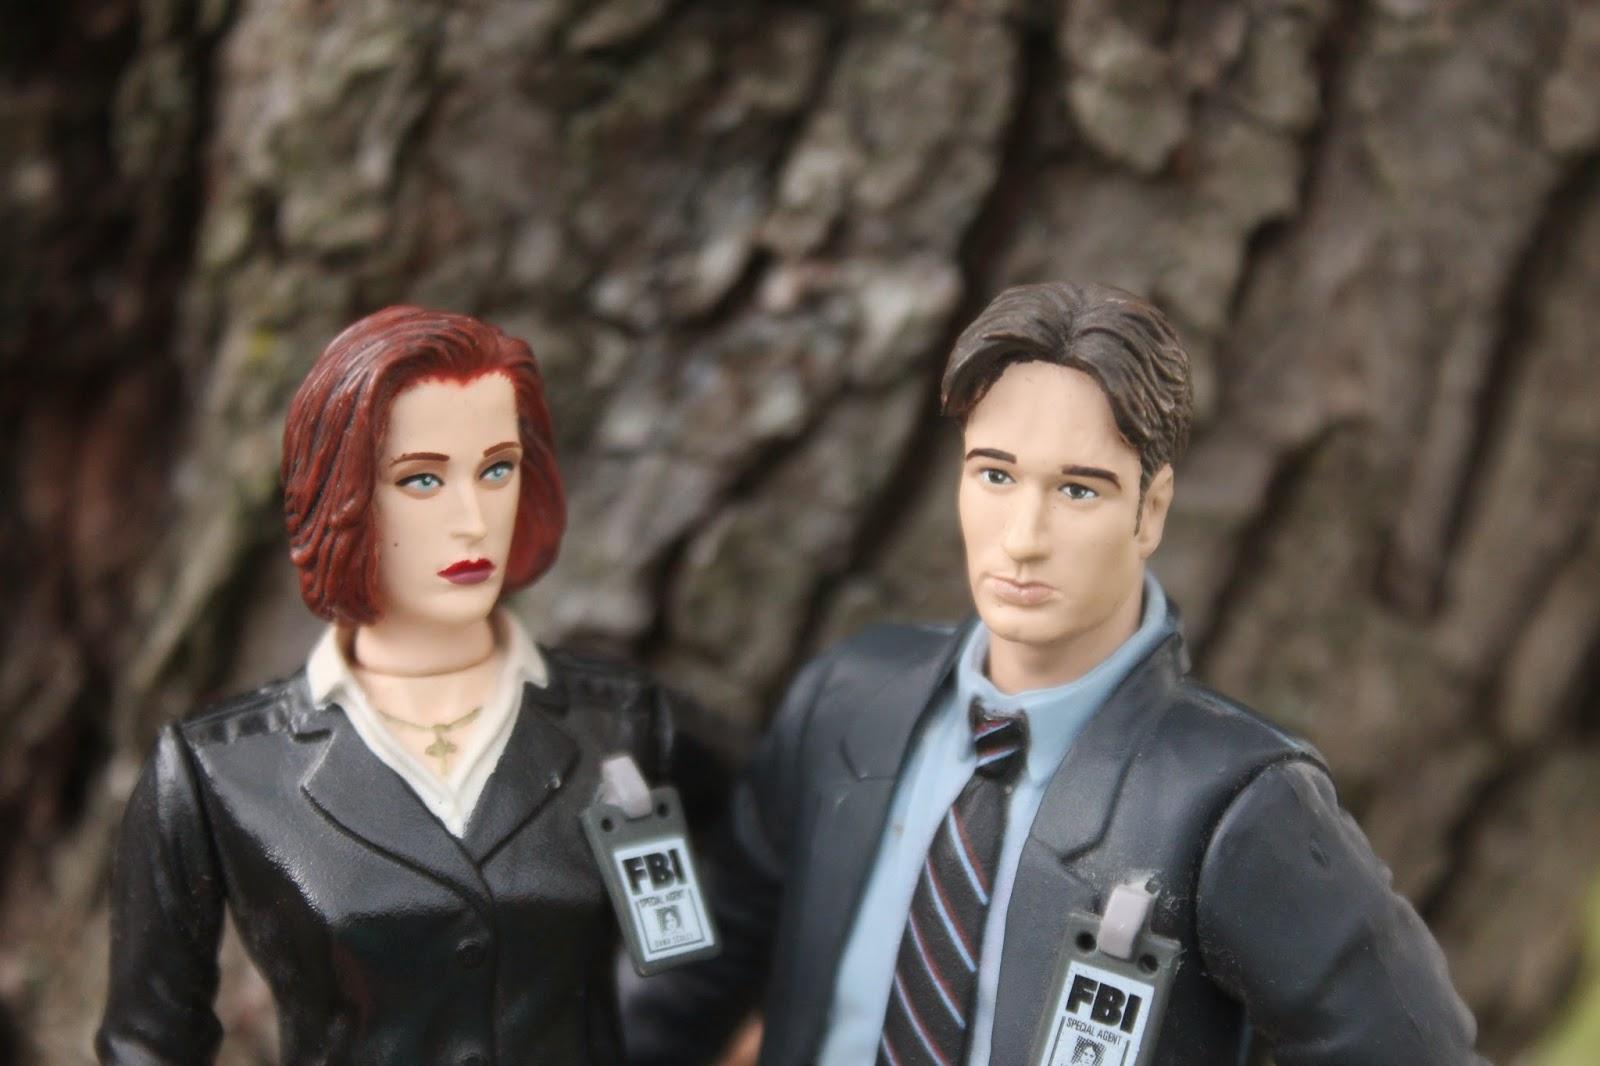 Barbie The X-Files Agent Dana Scully Doll | Dana scully, X